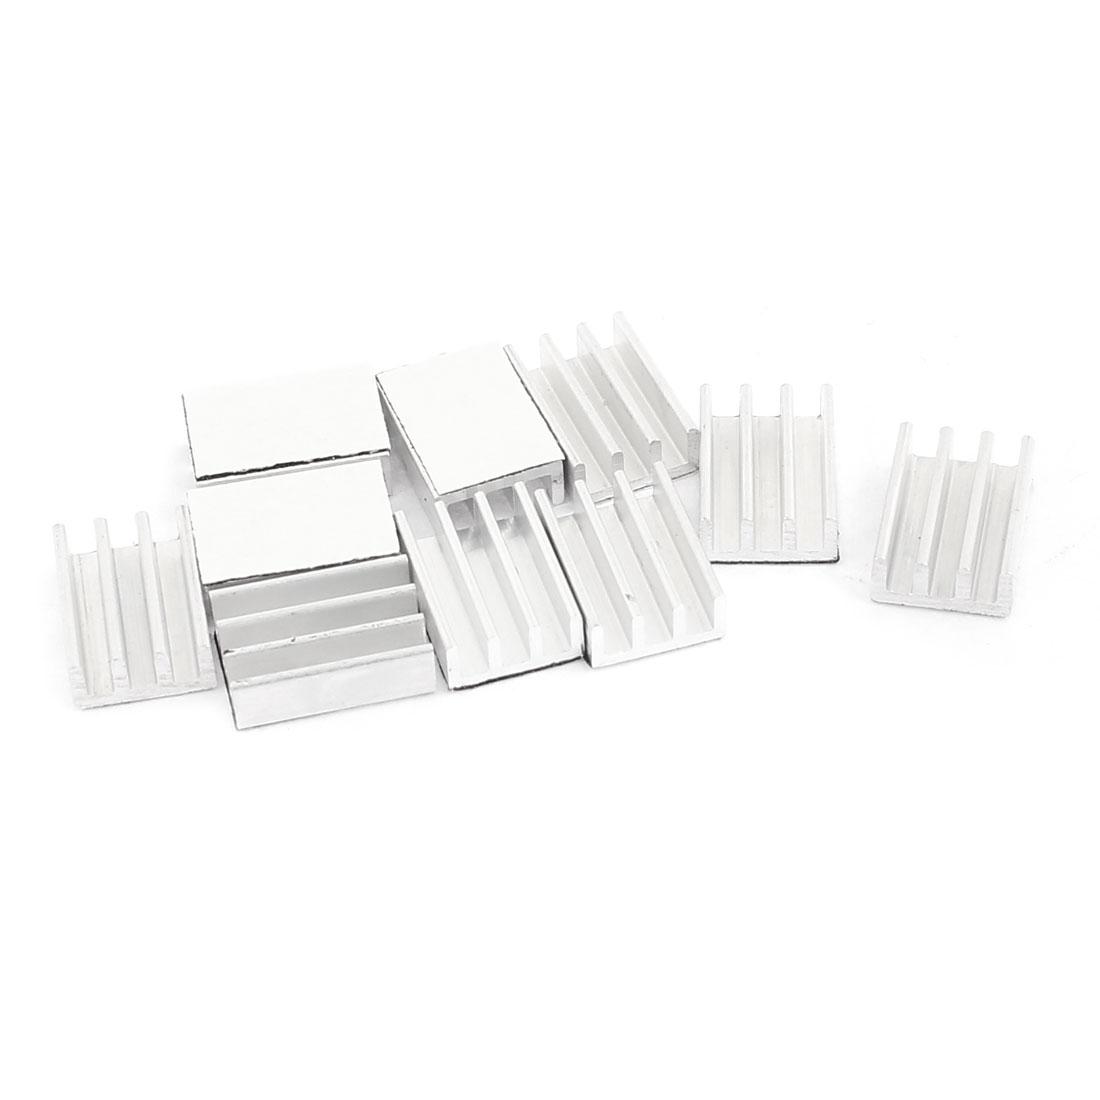 Silver Tone Aluminum Heatsink Cooling Fin 16 x 11 x 5mm 10pcs for CPU IC Chip